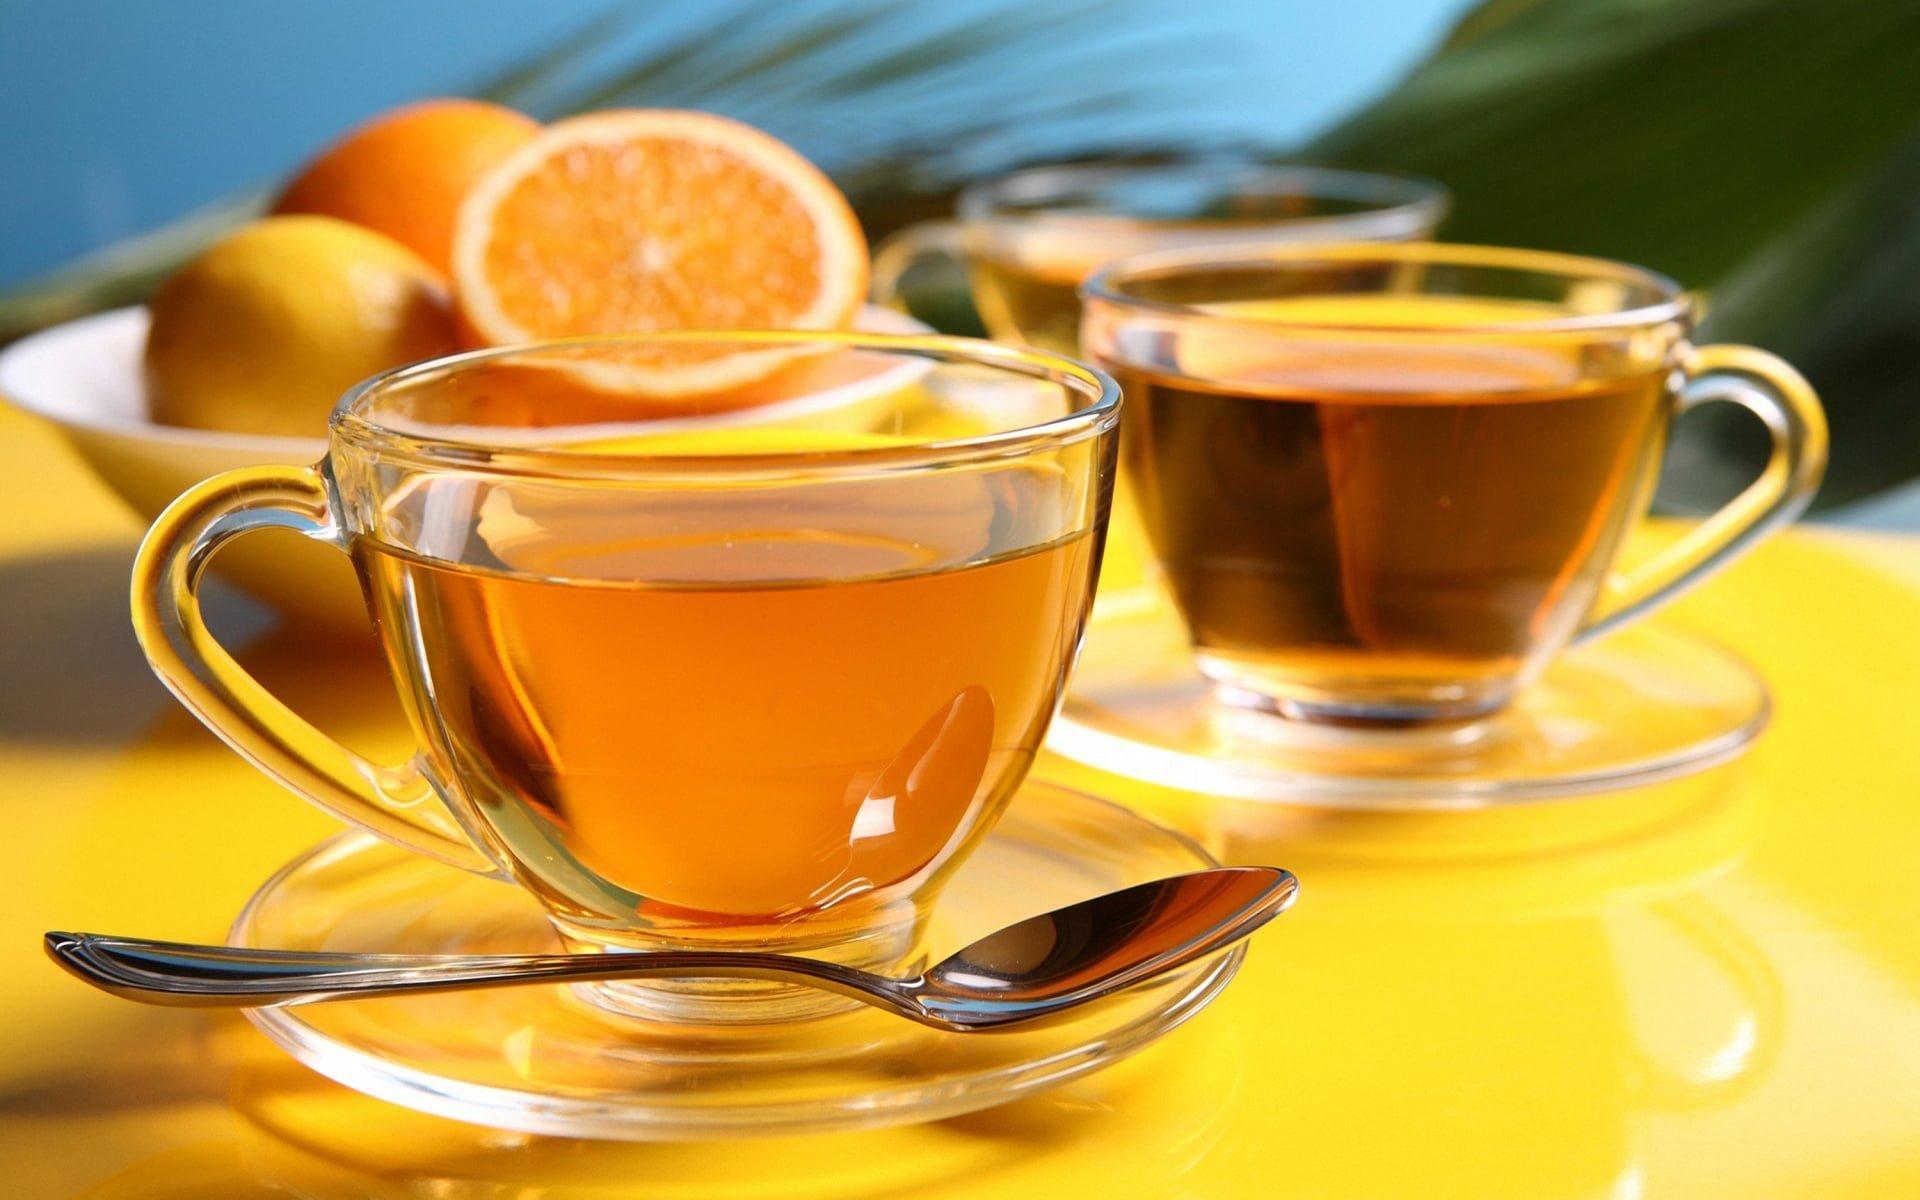 Portakal Resimleri